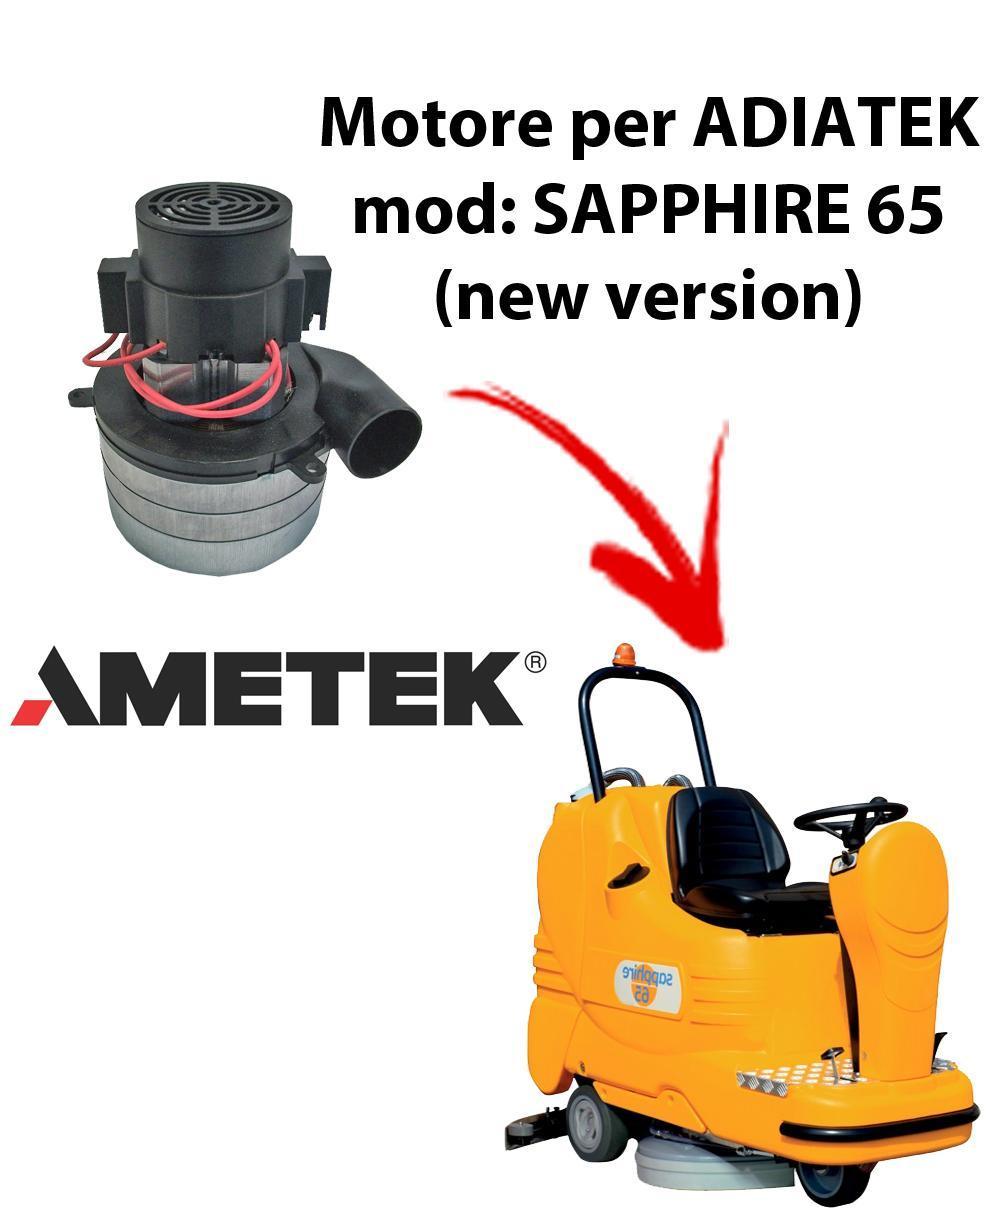 Sapphire 65 (new version) Motore de aspiración Ametek Italia  para fregadora Adiatek